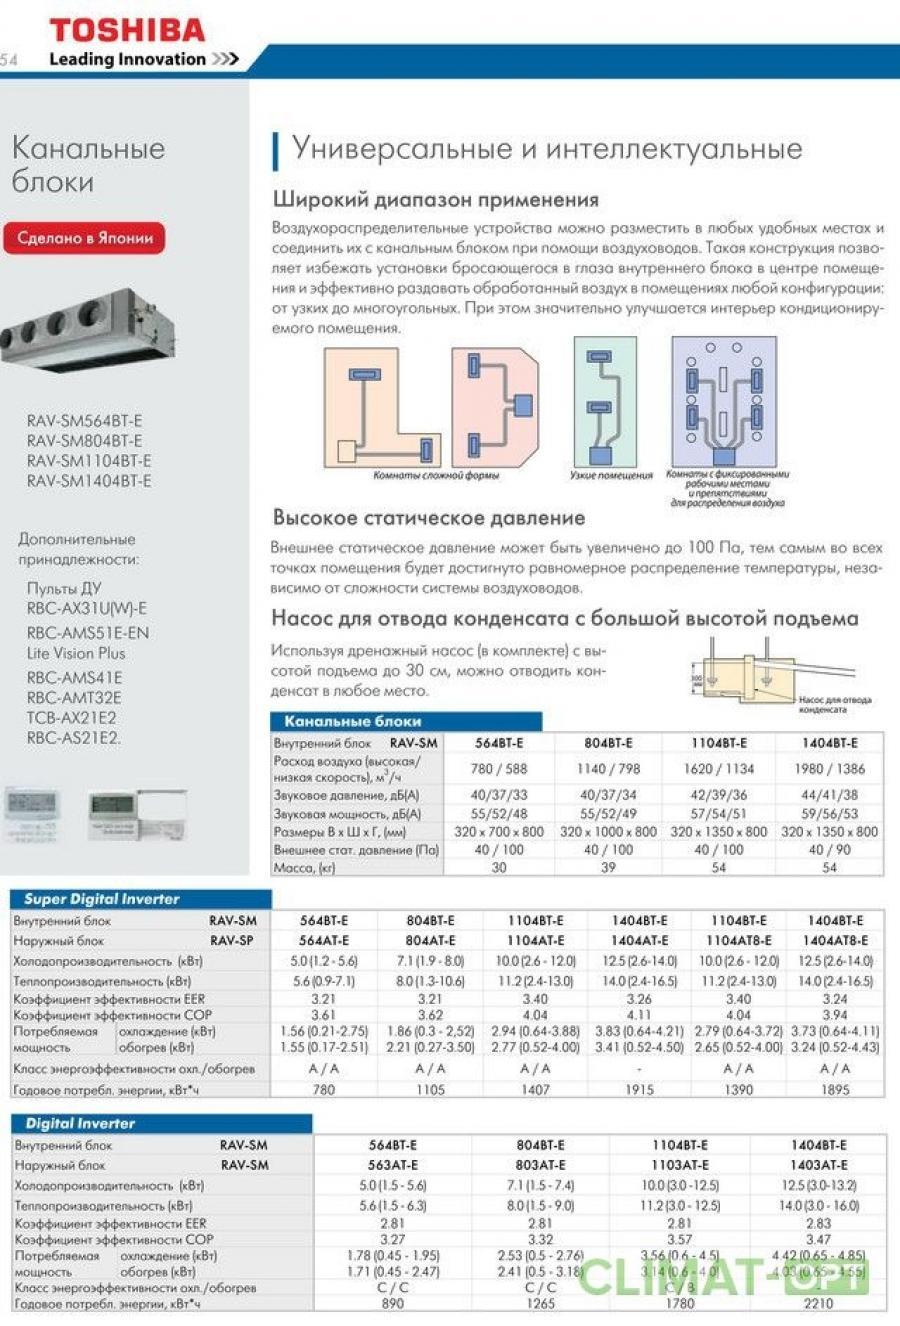 Канальные кондиционеры Toshiba SM_SDT-E Inverter